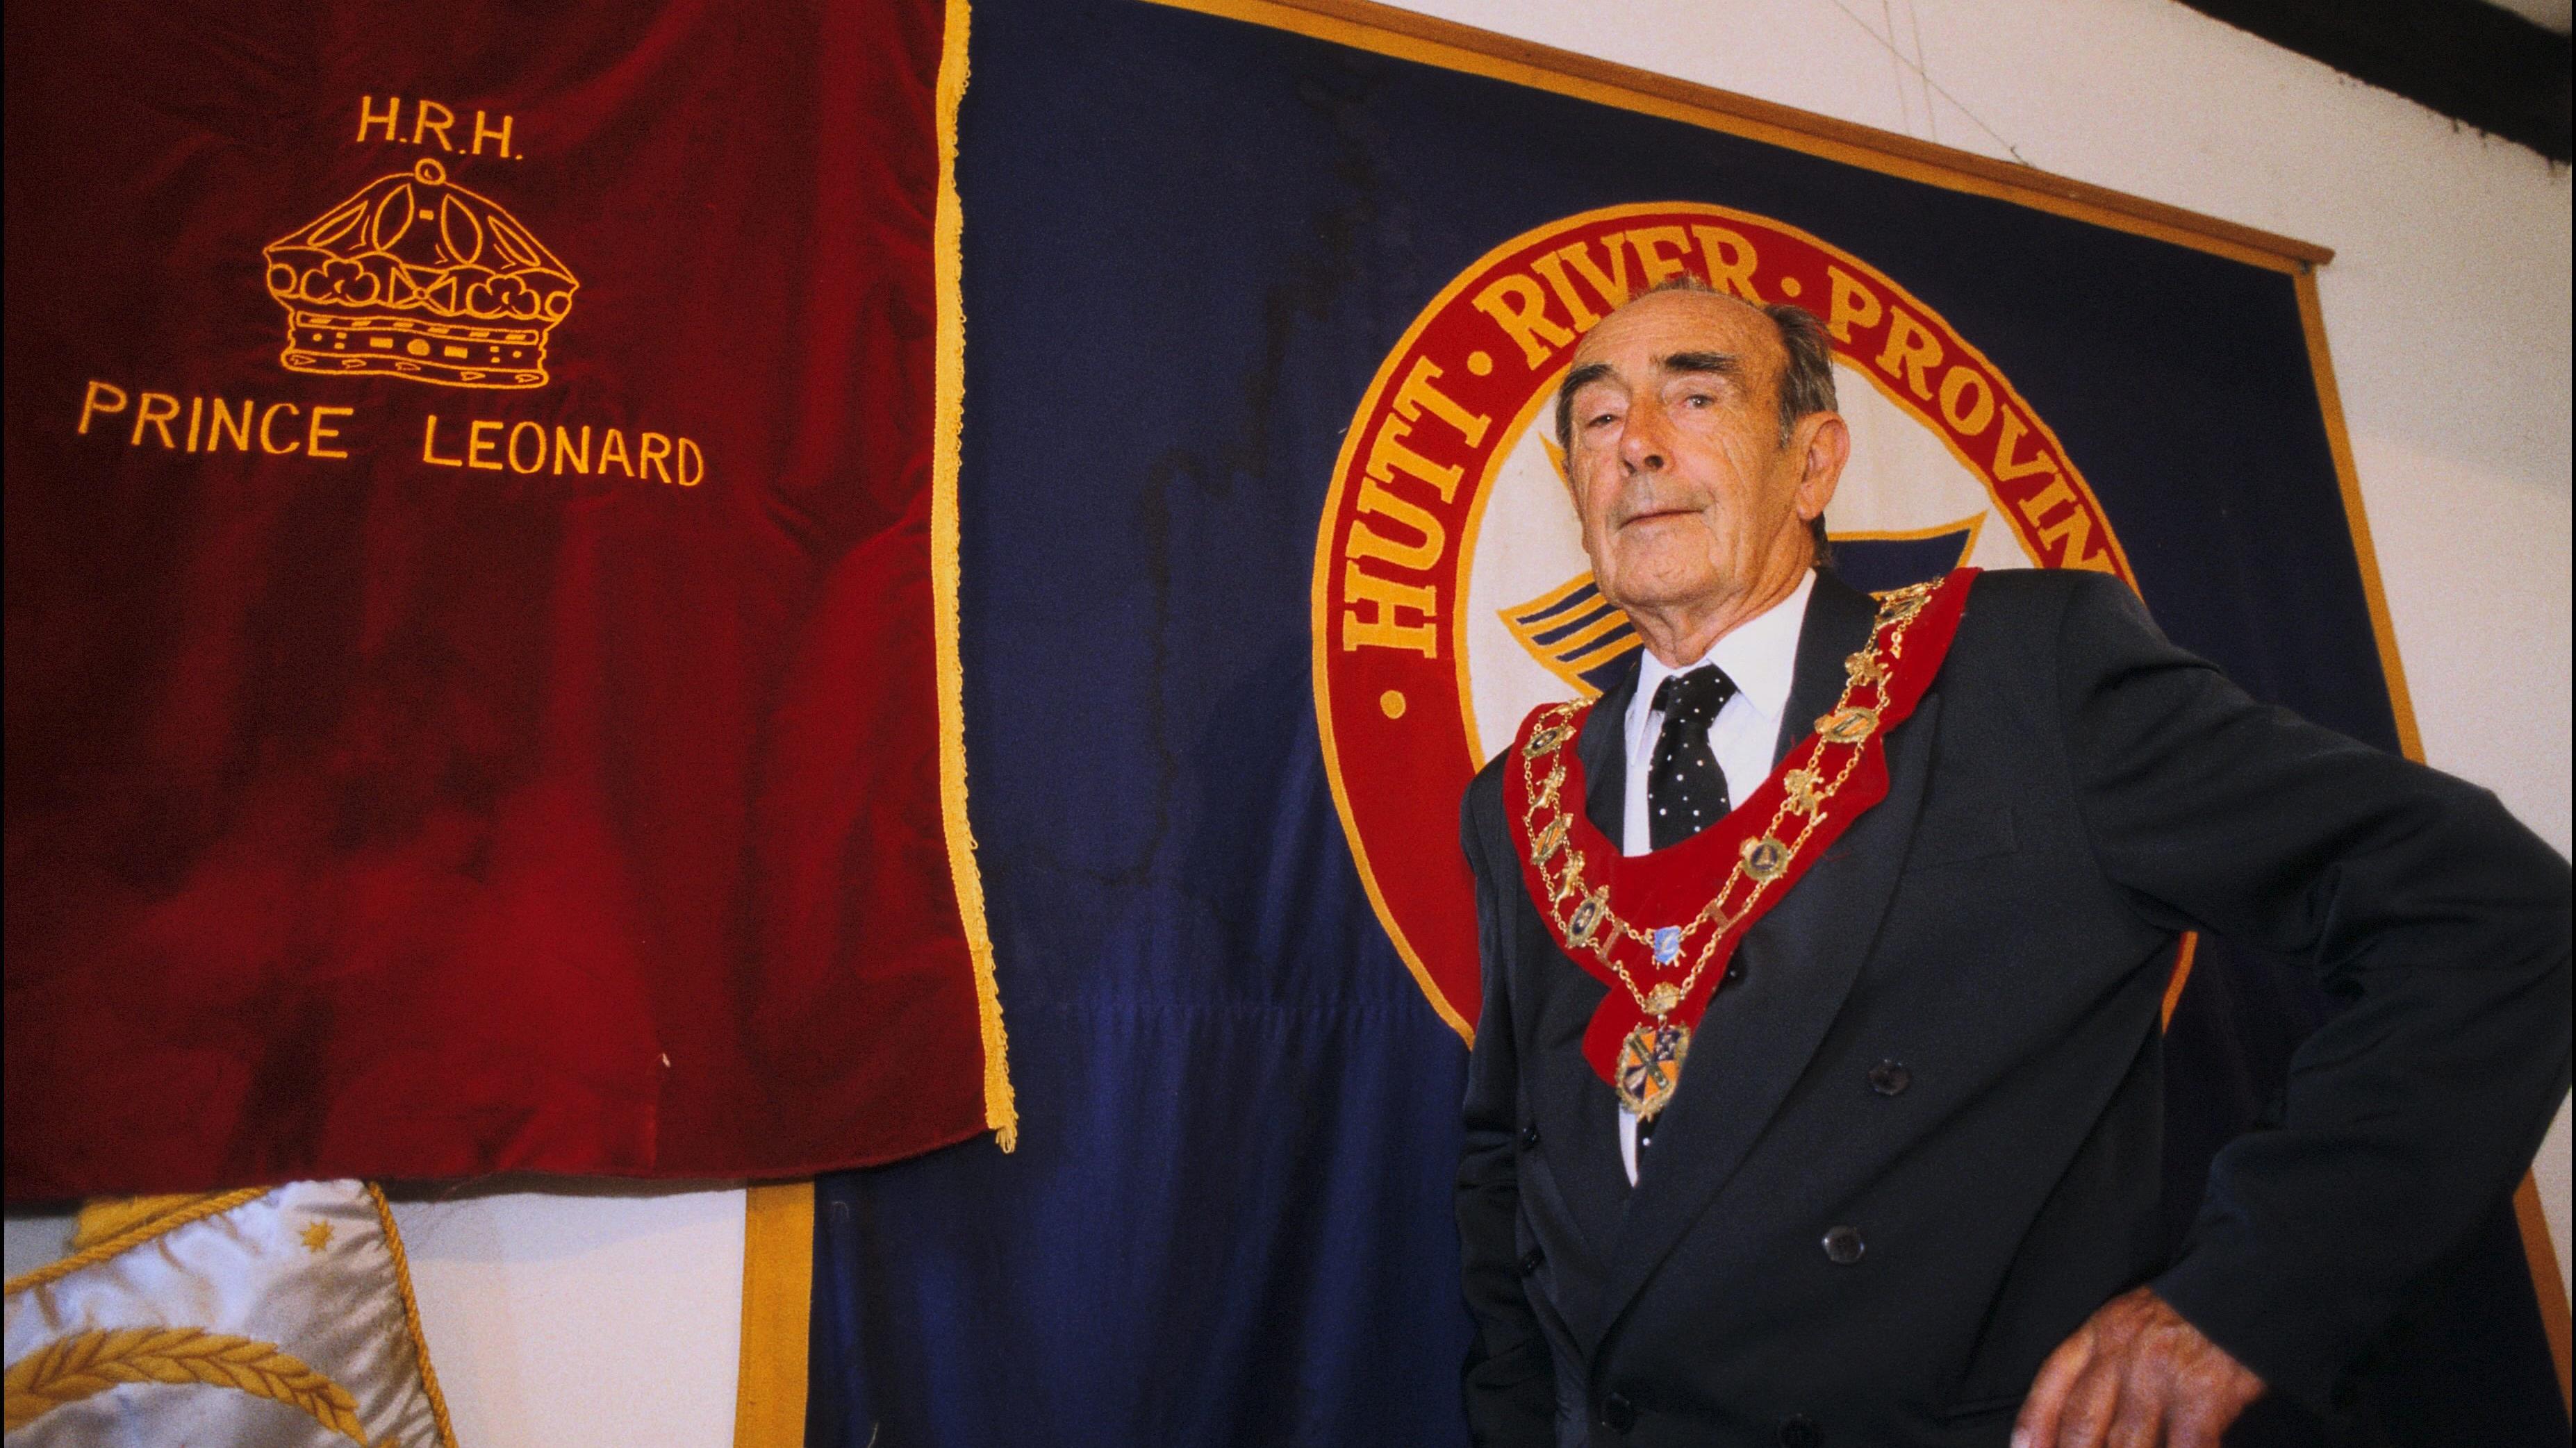 Hutt River founder Prince Leonard Casley in 1998.